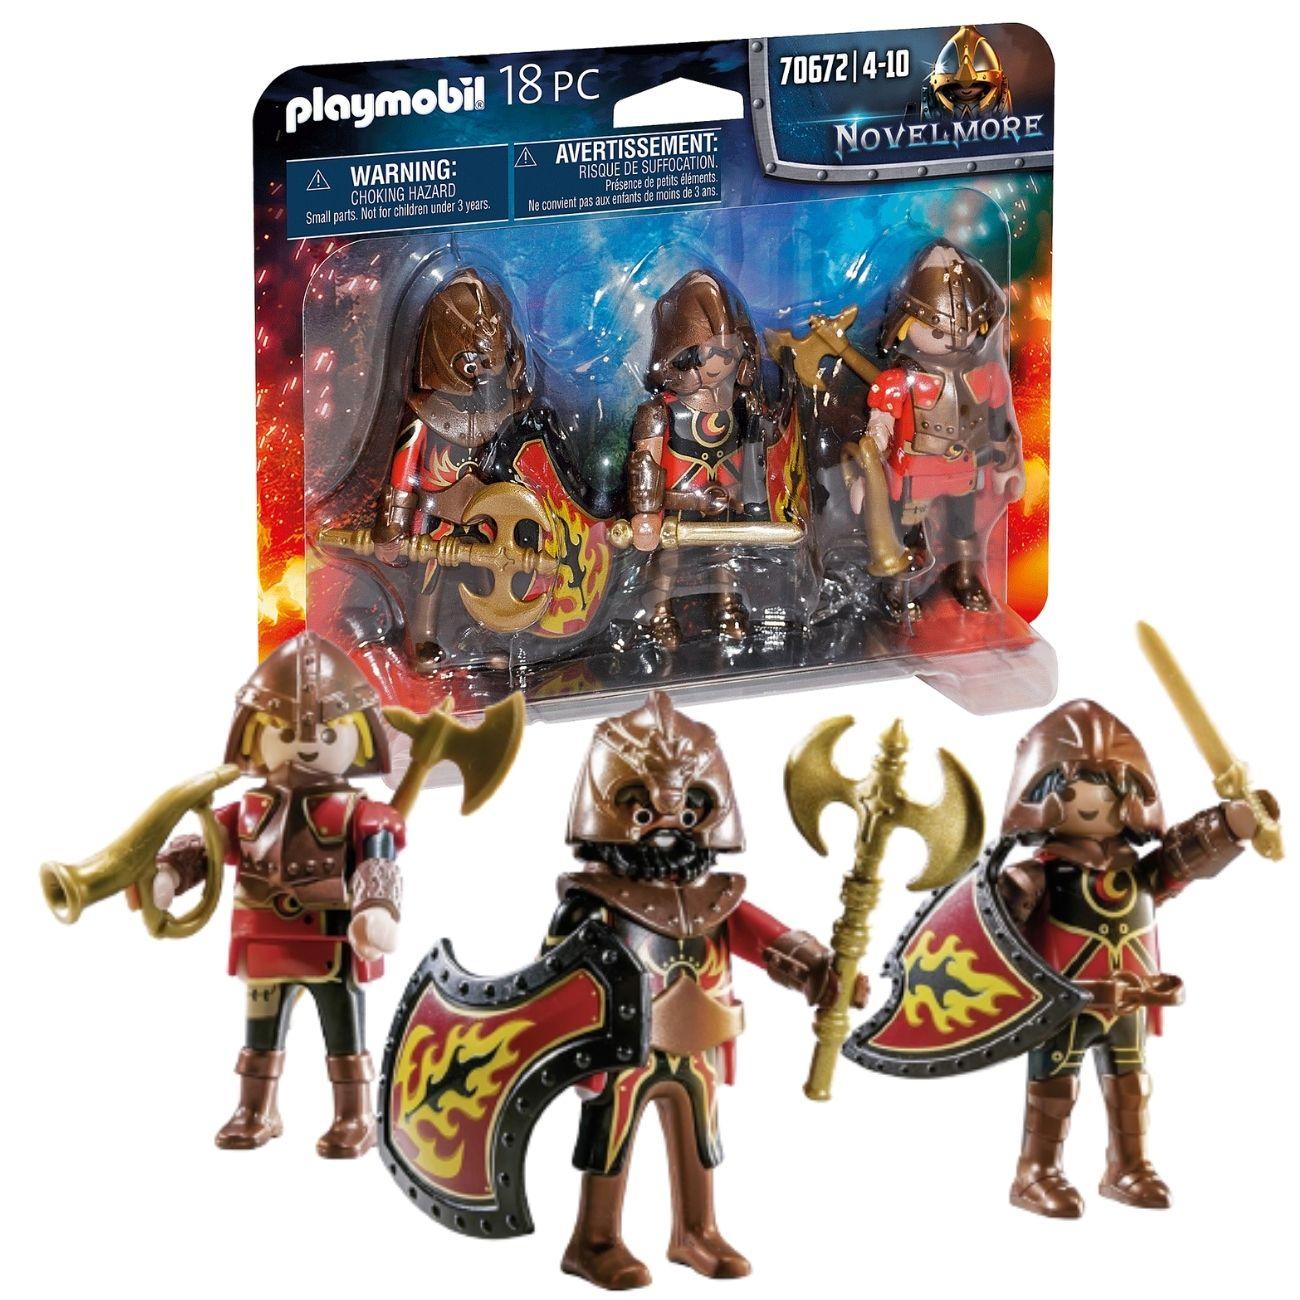 Playmobil - Pack 3 Figuras Corsarios Burnham Novelmore 70672